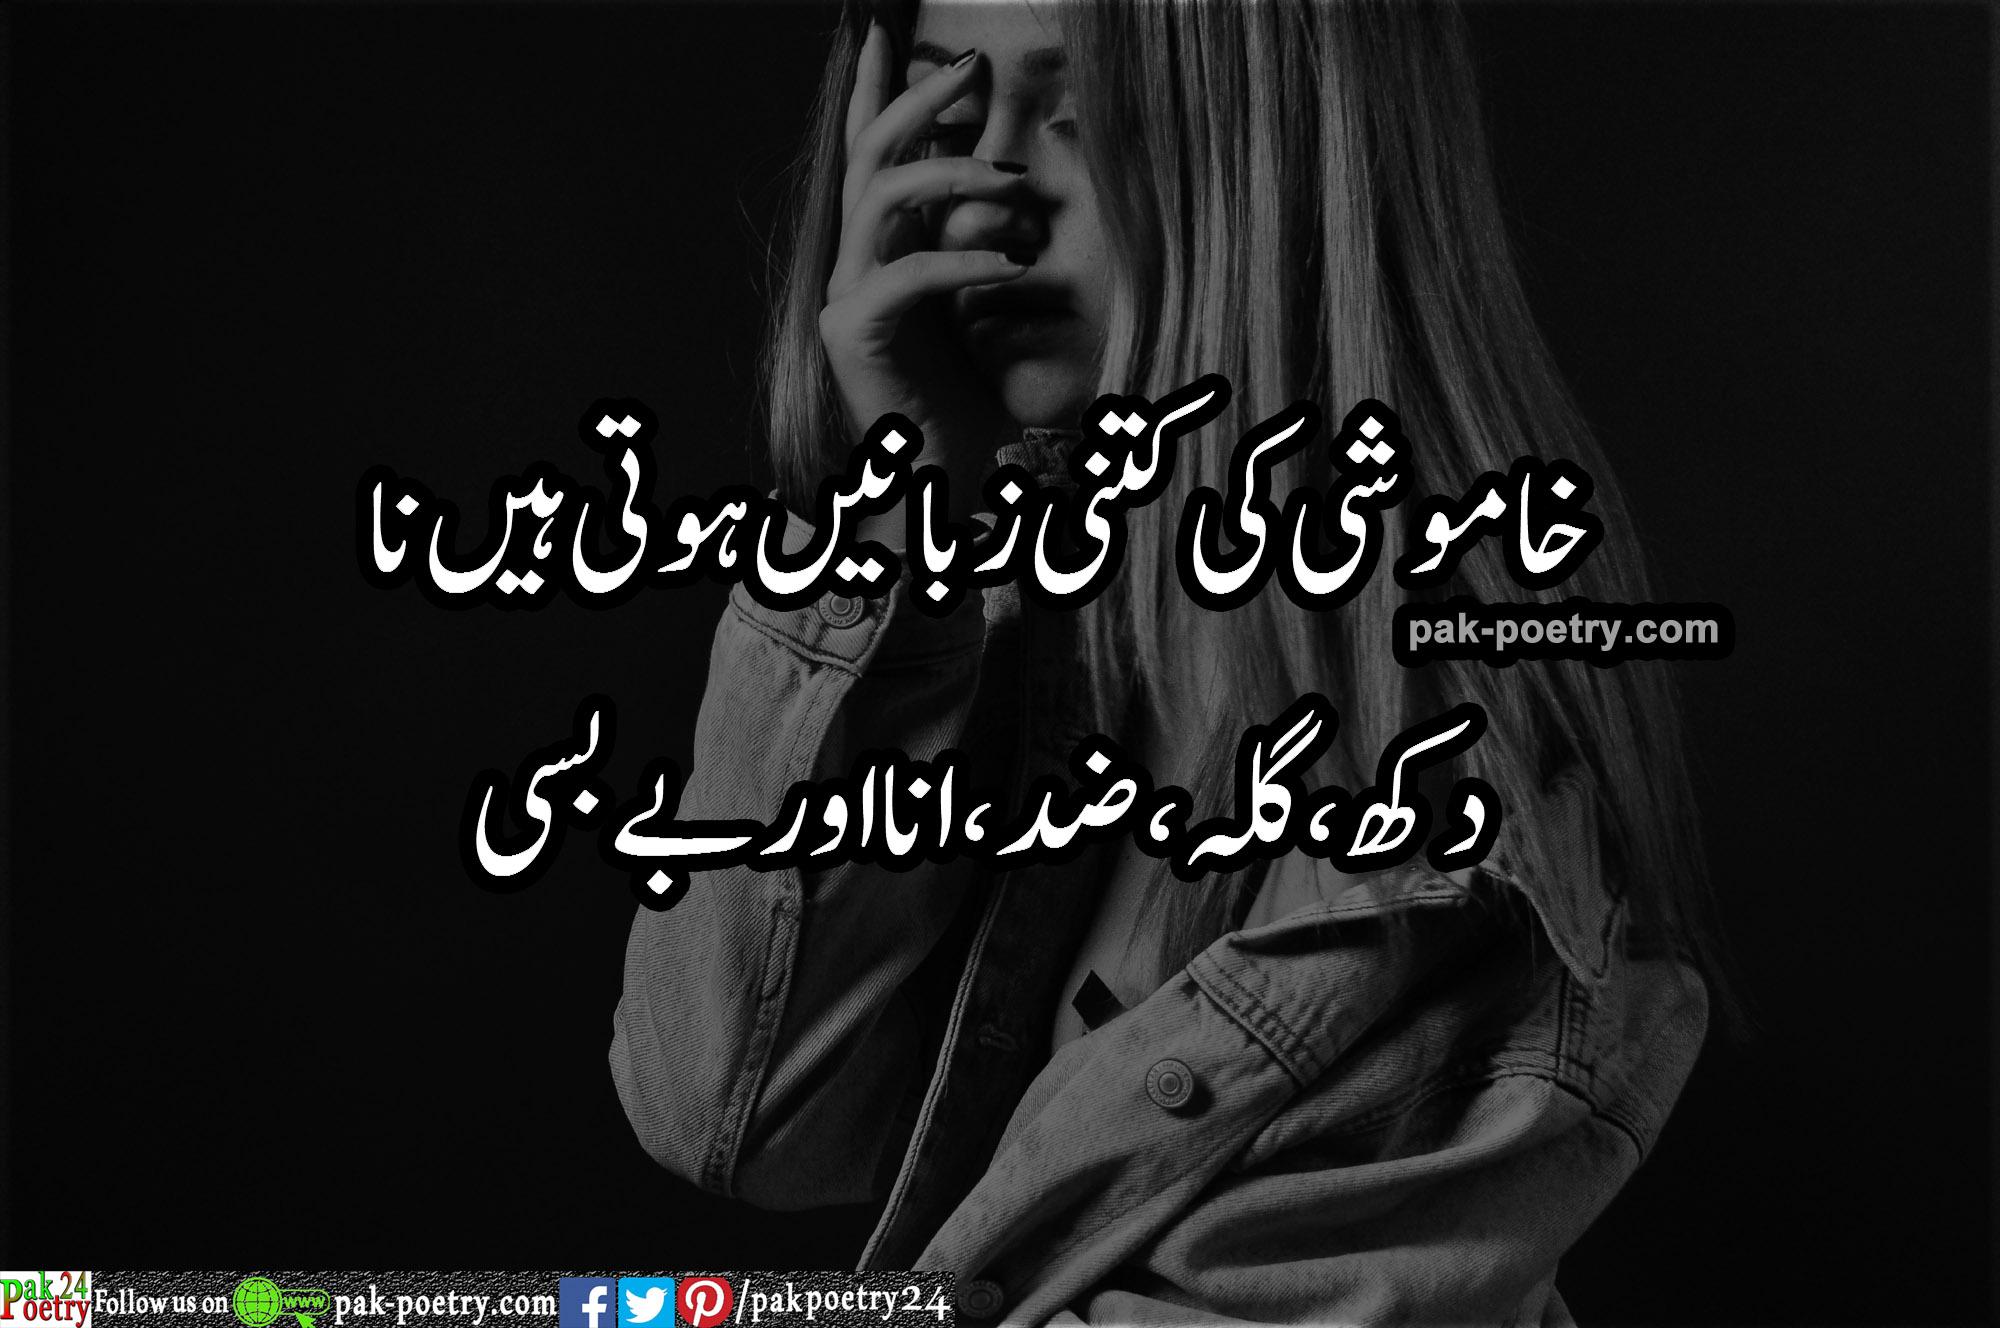 Poetry about Reality - khamoshi ki ktni zubaney hoti